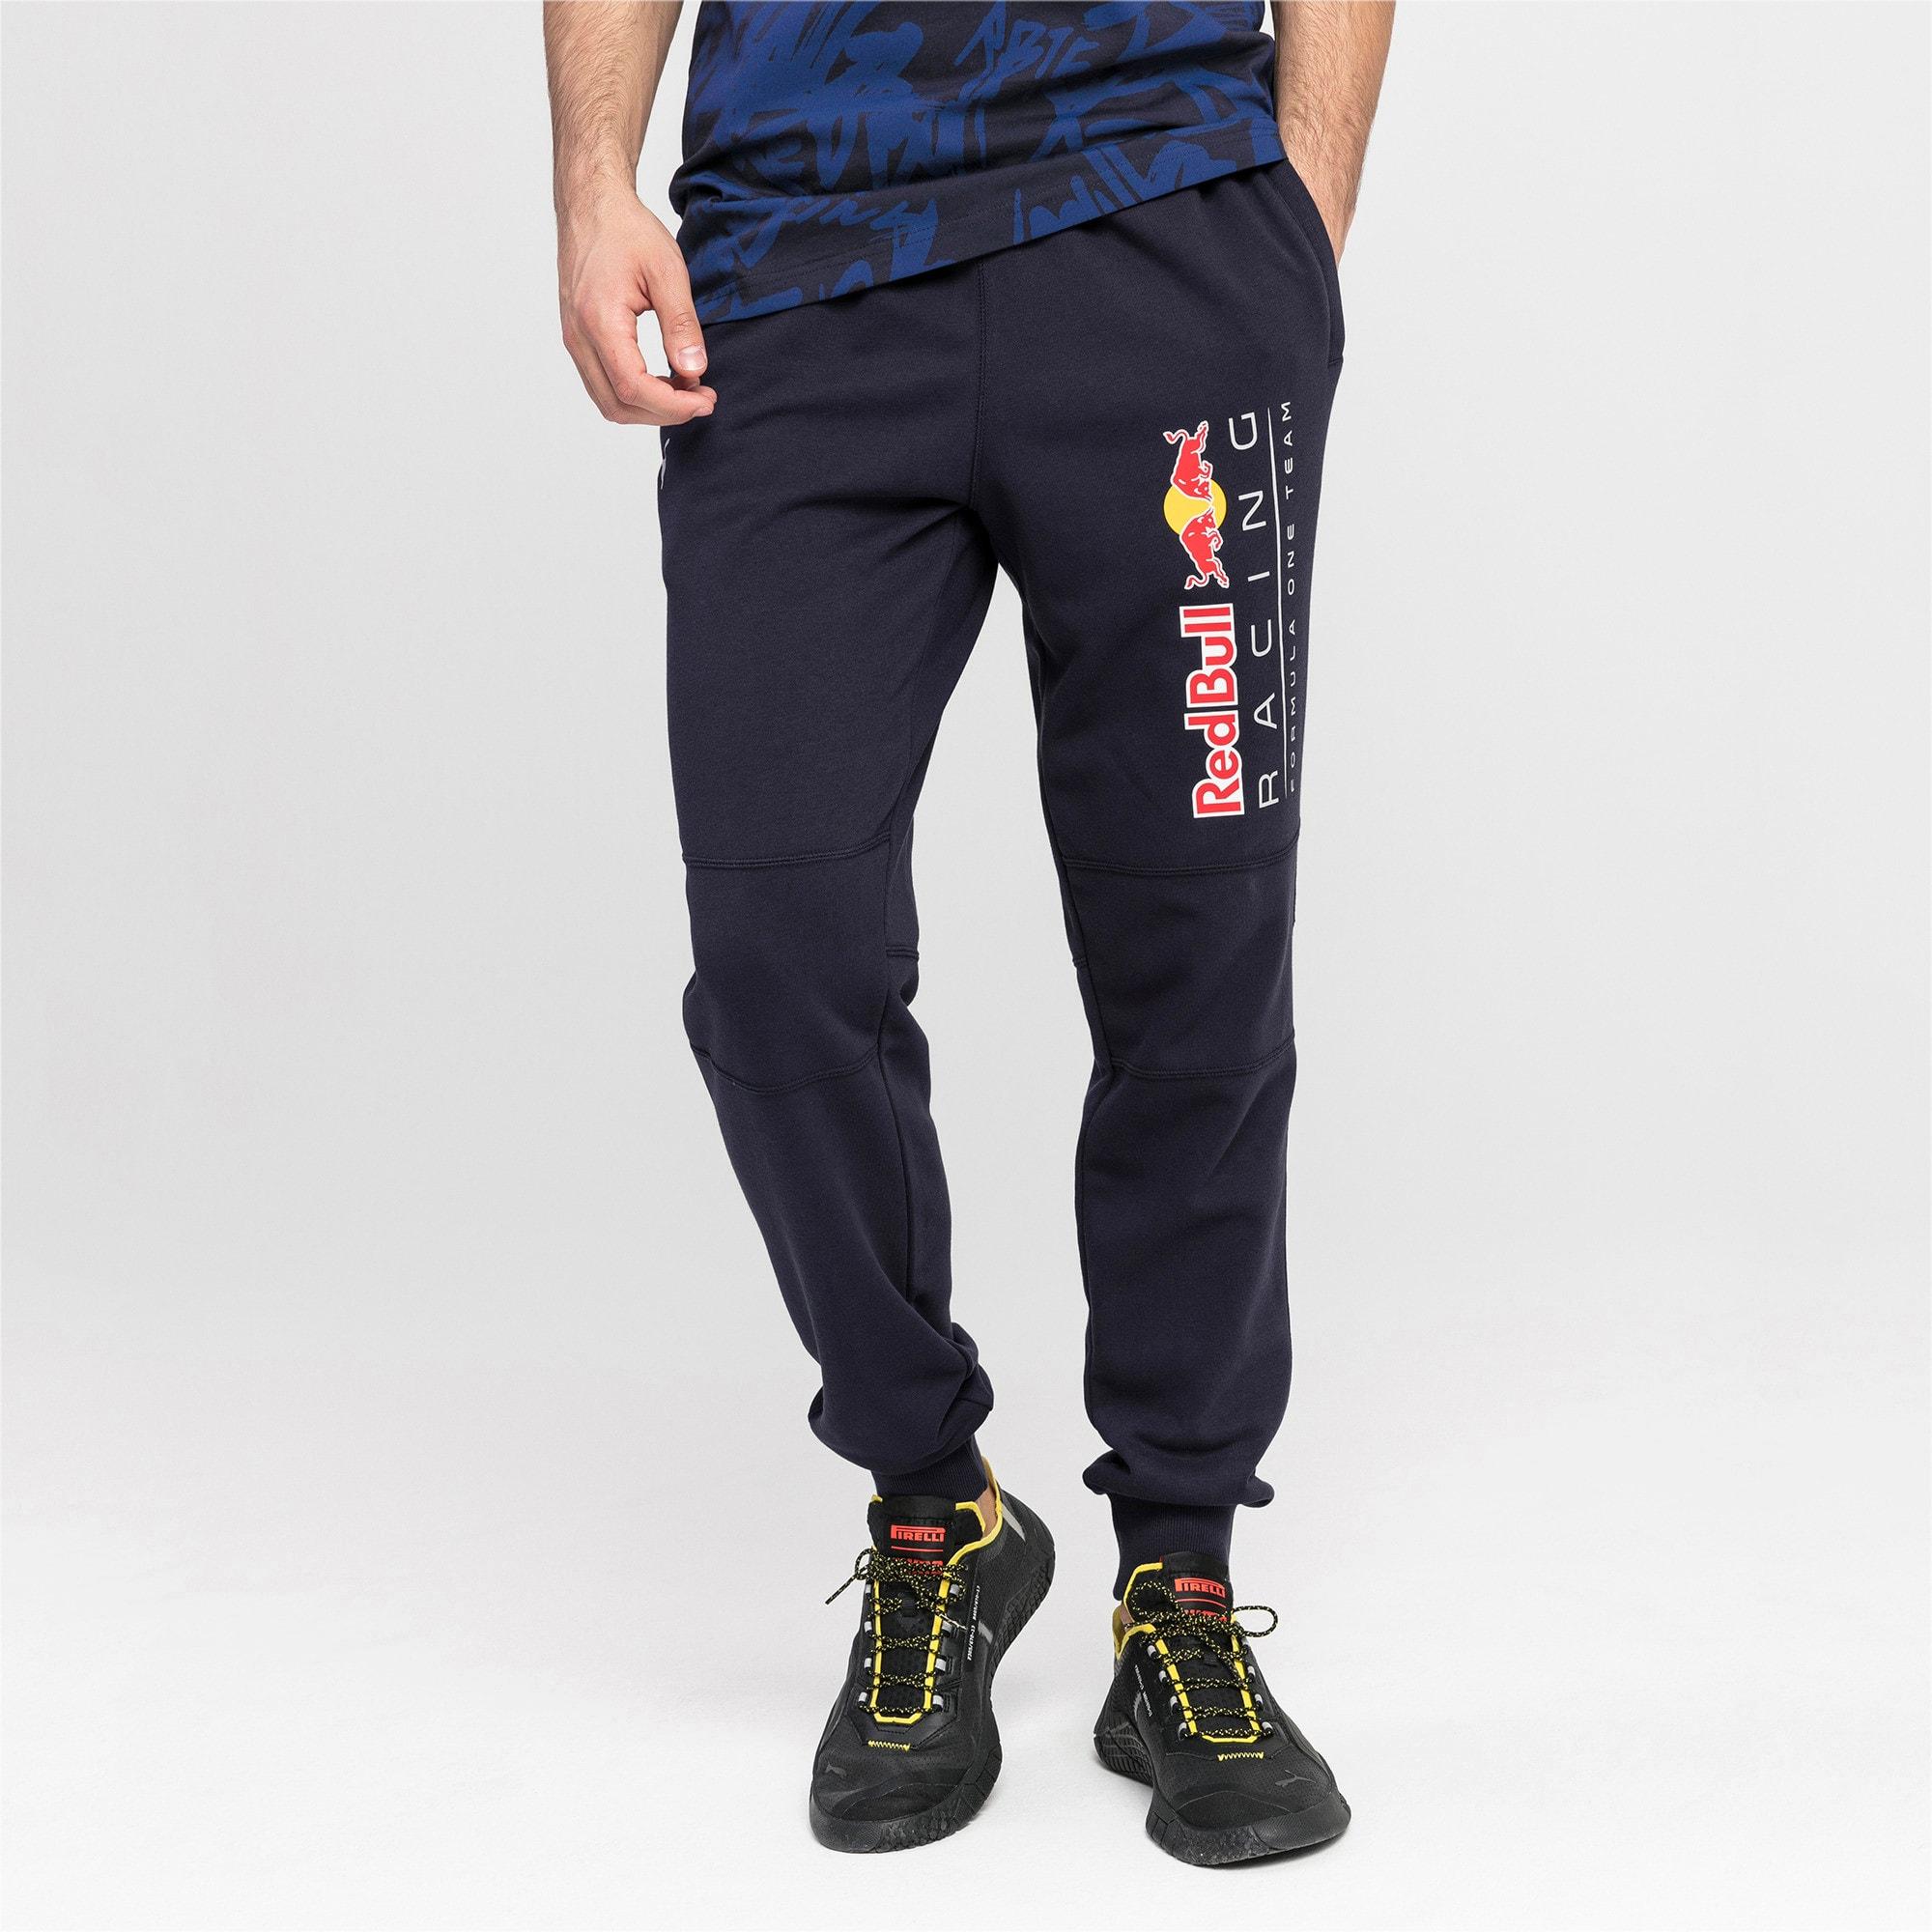 Thumbnail 1 of Red Bull Racing Knitted Men's Sweat Pants, NIGHT SKY, medium